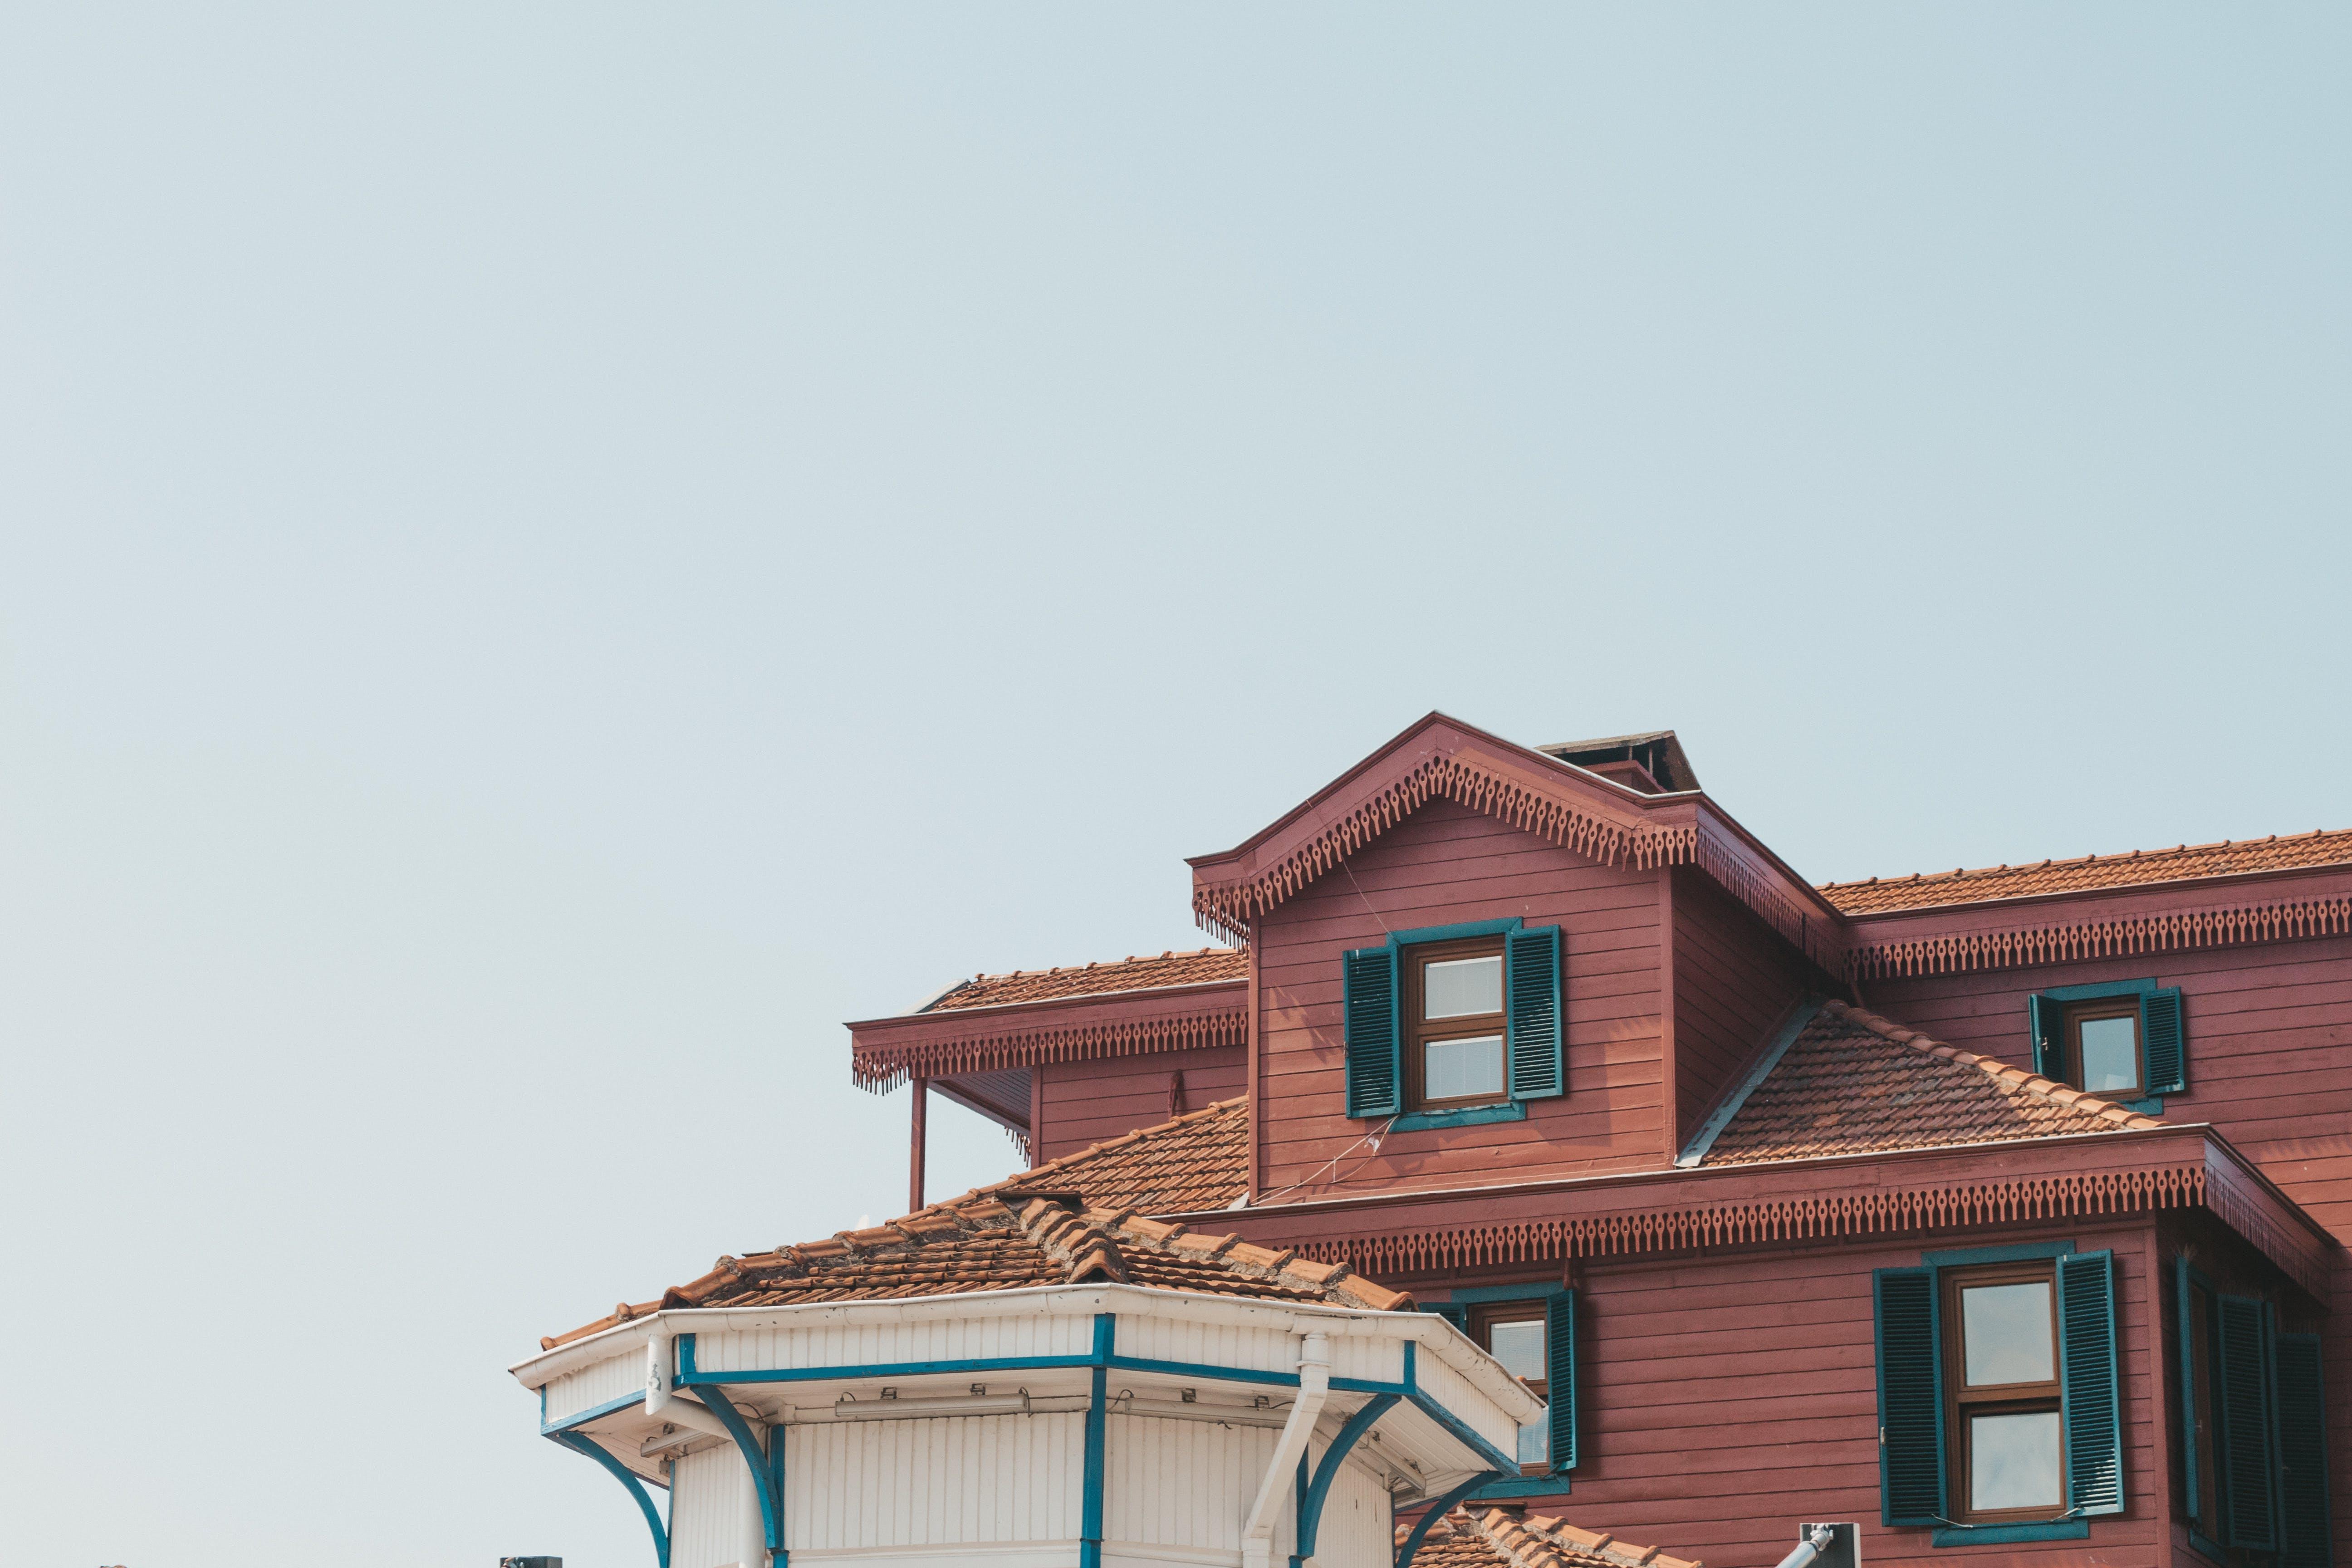 Foto stok gratis Arsitektur, atap, cokelat, desain arsitektur